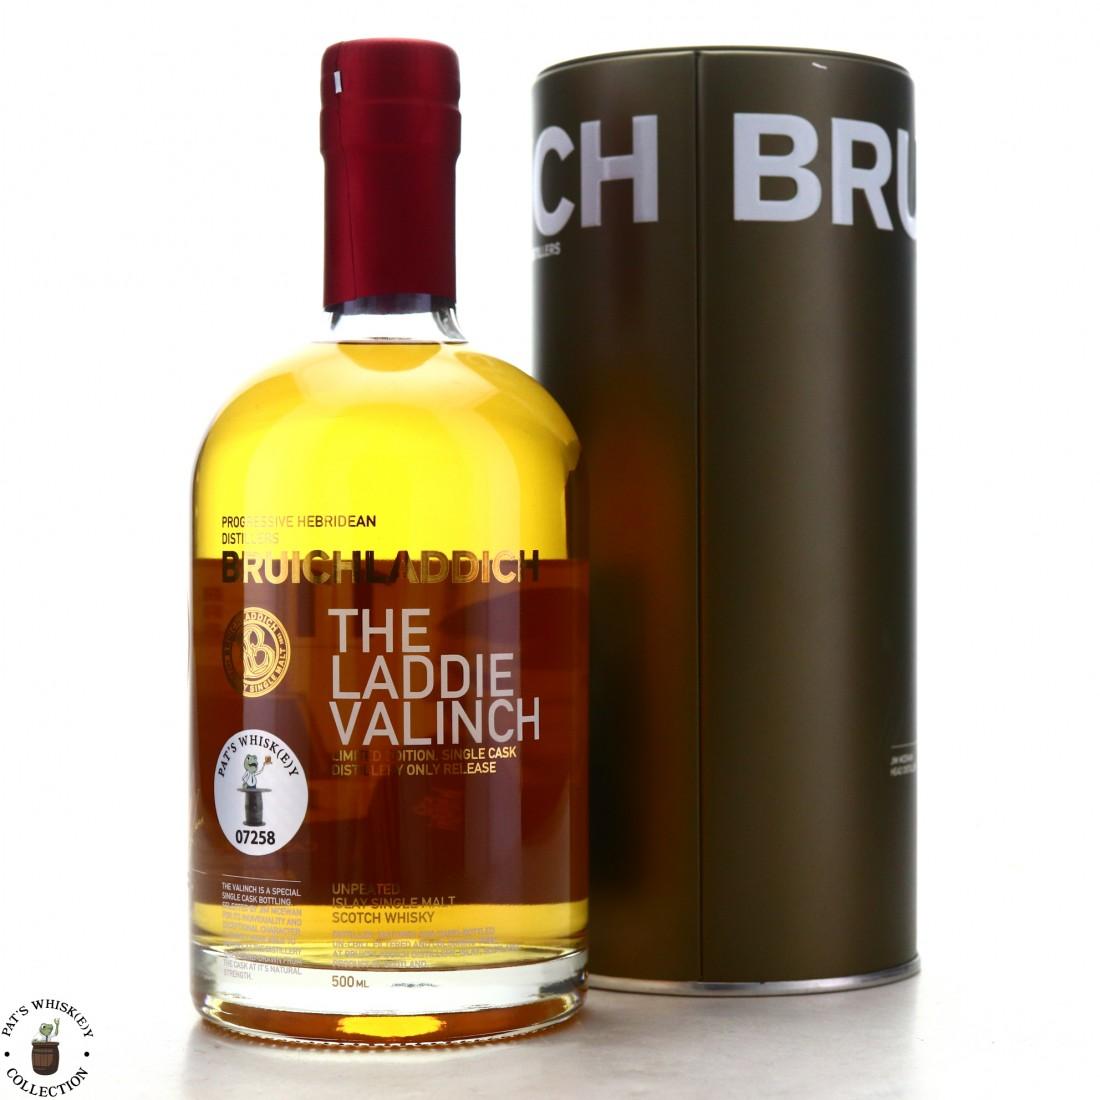 Bruichladdich 1992 Raymond Tibbs Valinch 22 Year Old / Calvados Finish